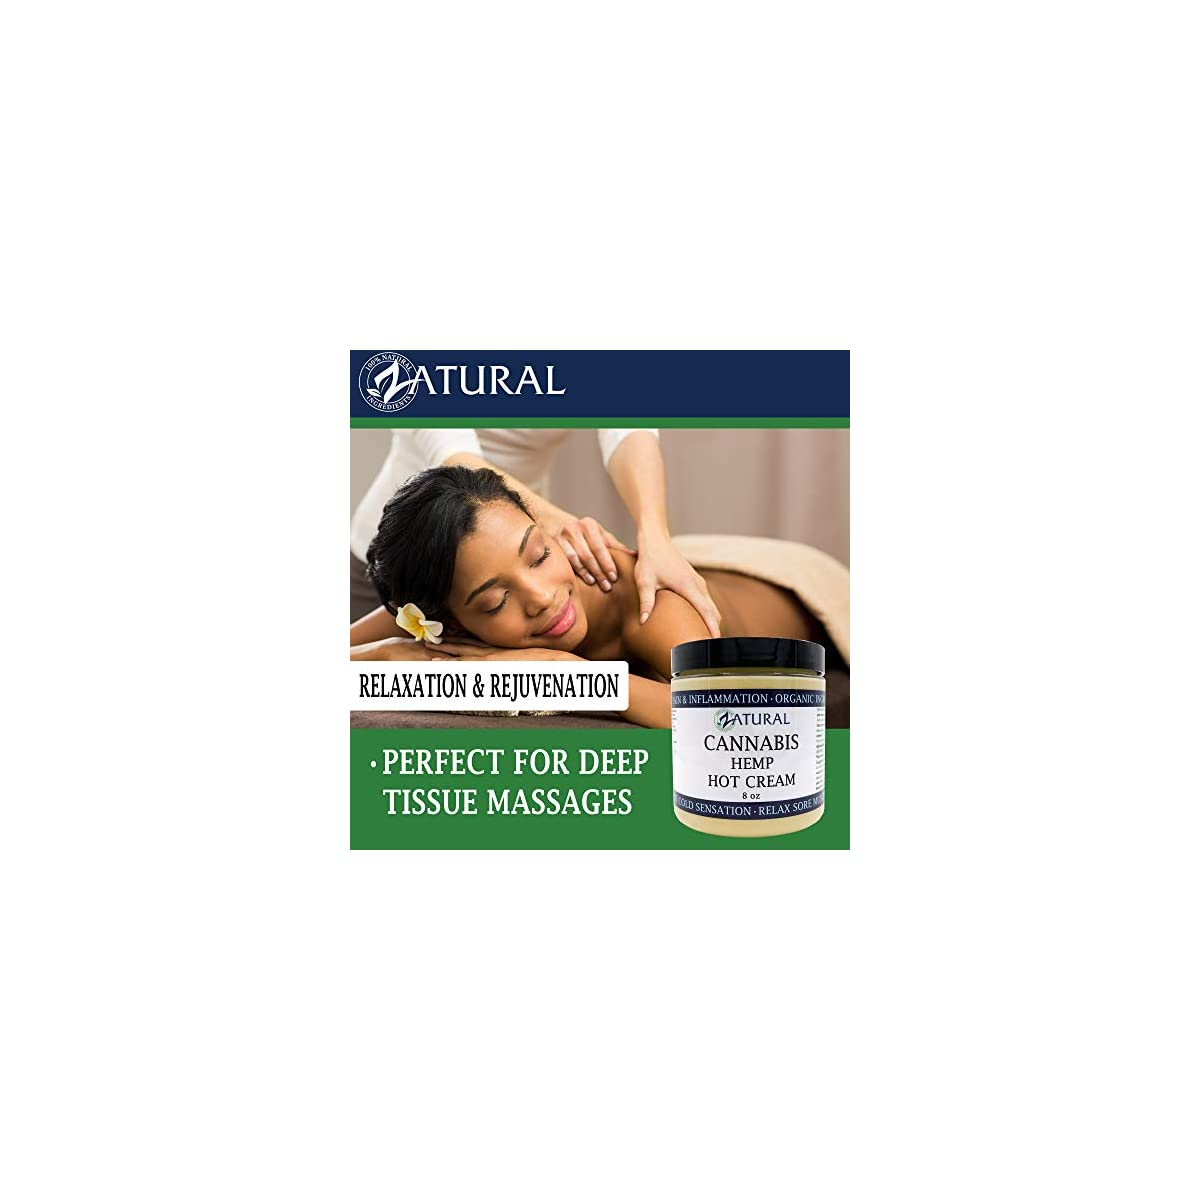 Hemp-Hot-Cream-Hemp-Oil-Organic-Hot-Cream-Anti-Cellulite-Muscle-Cream-Pain-Support